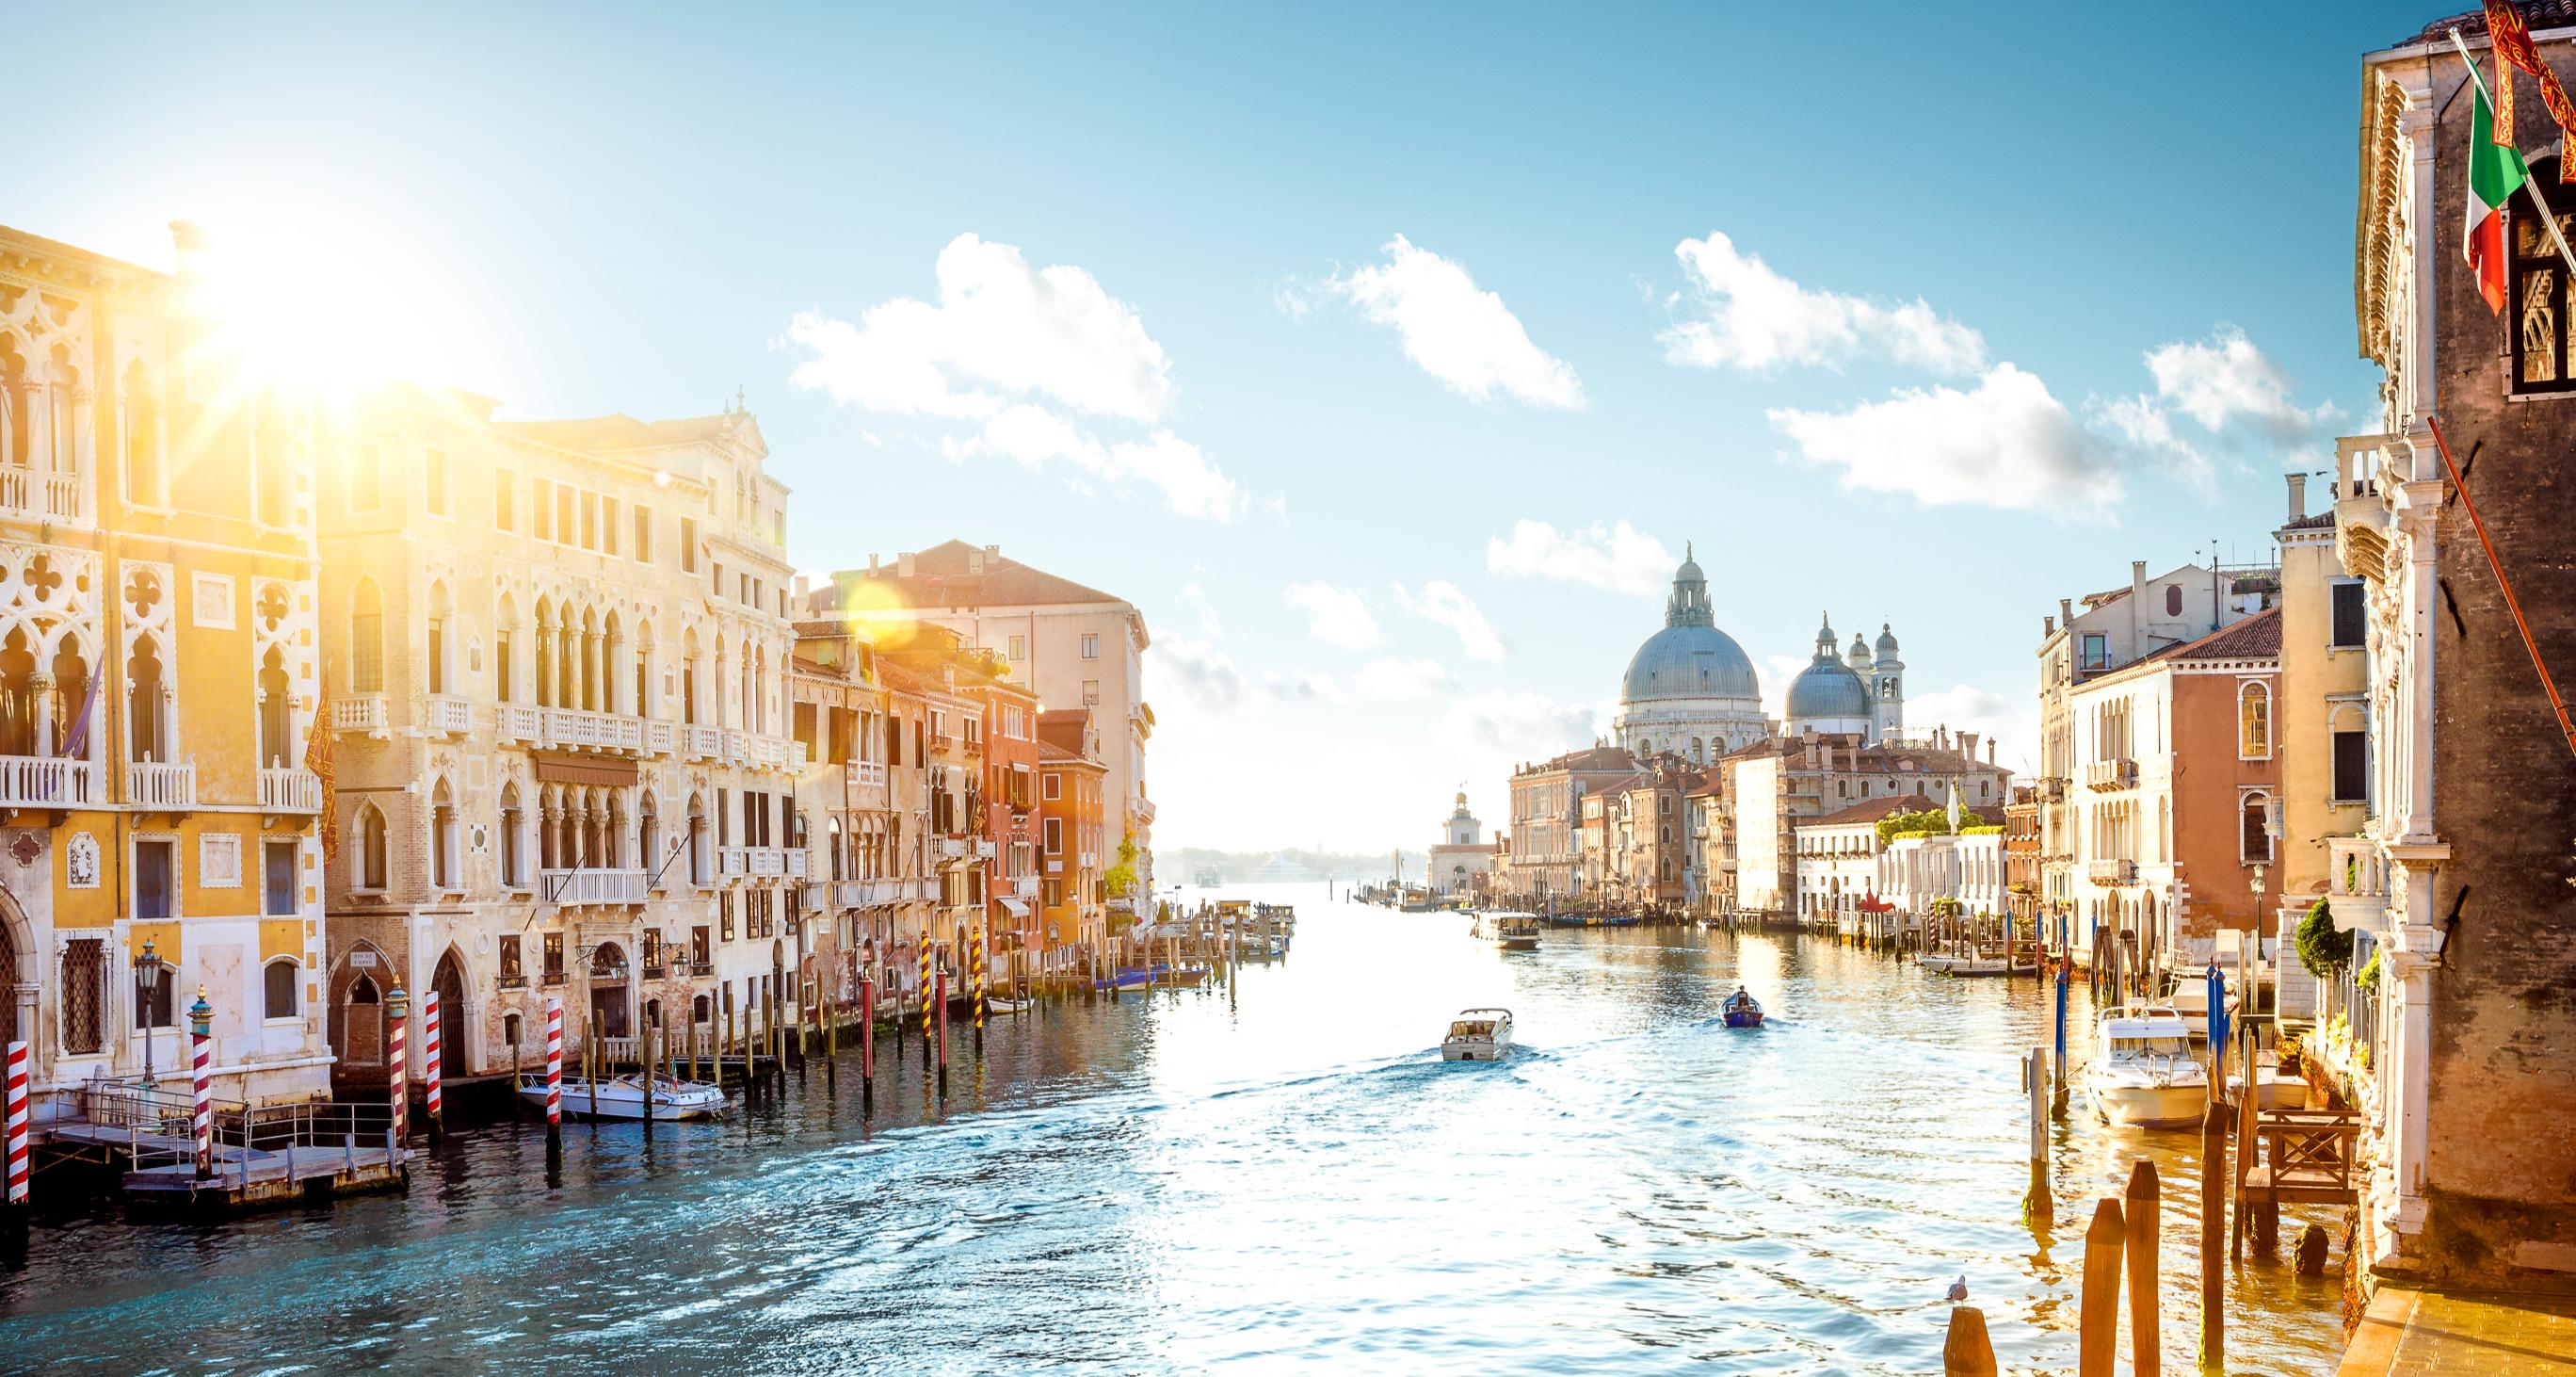 VCE - Venice Marco Polo Airport